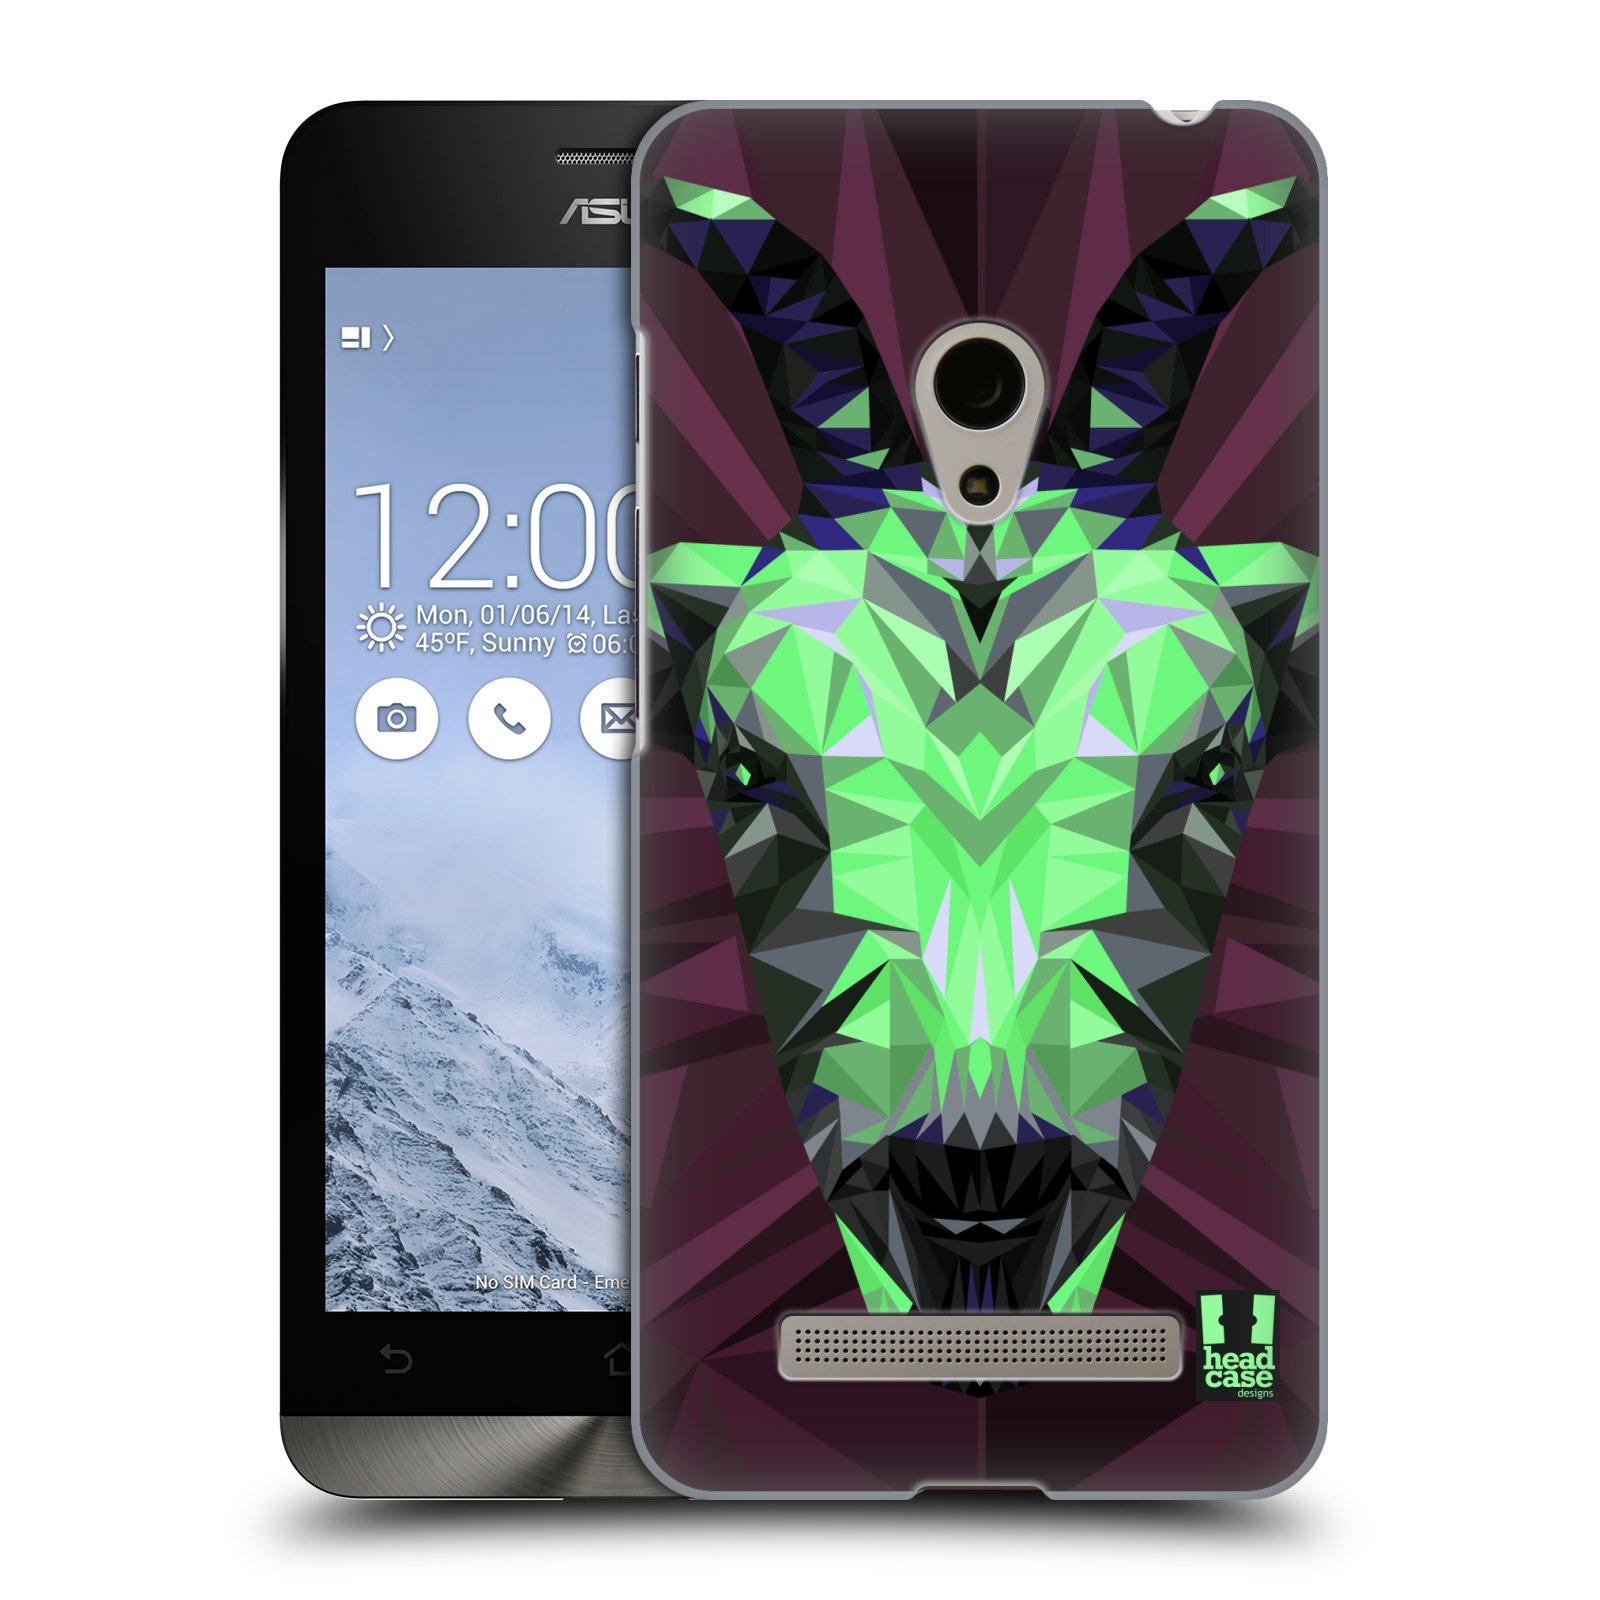 HEAD CASE plastový obal na mobil Asus Zenfone 5 vzor Geometrická zvířata 2 kozel